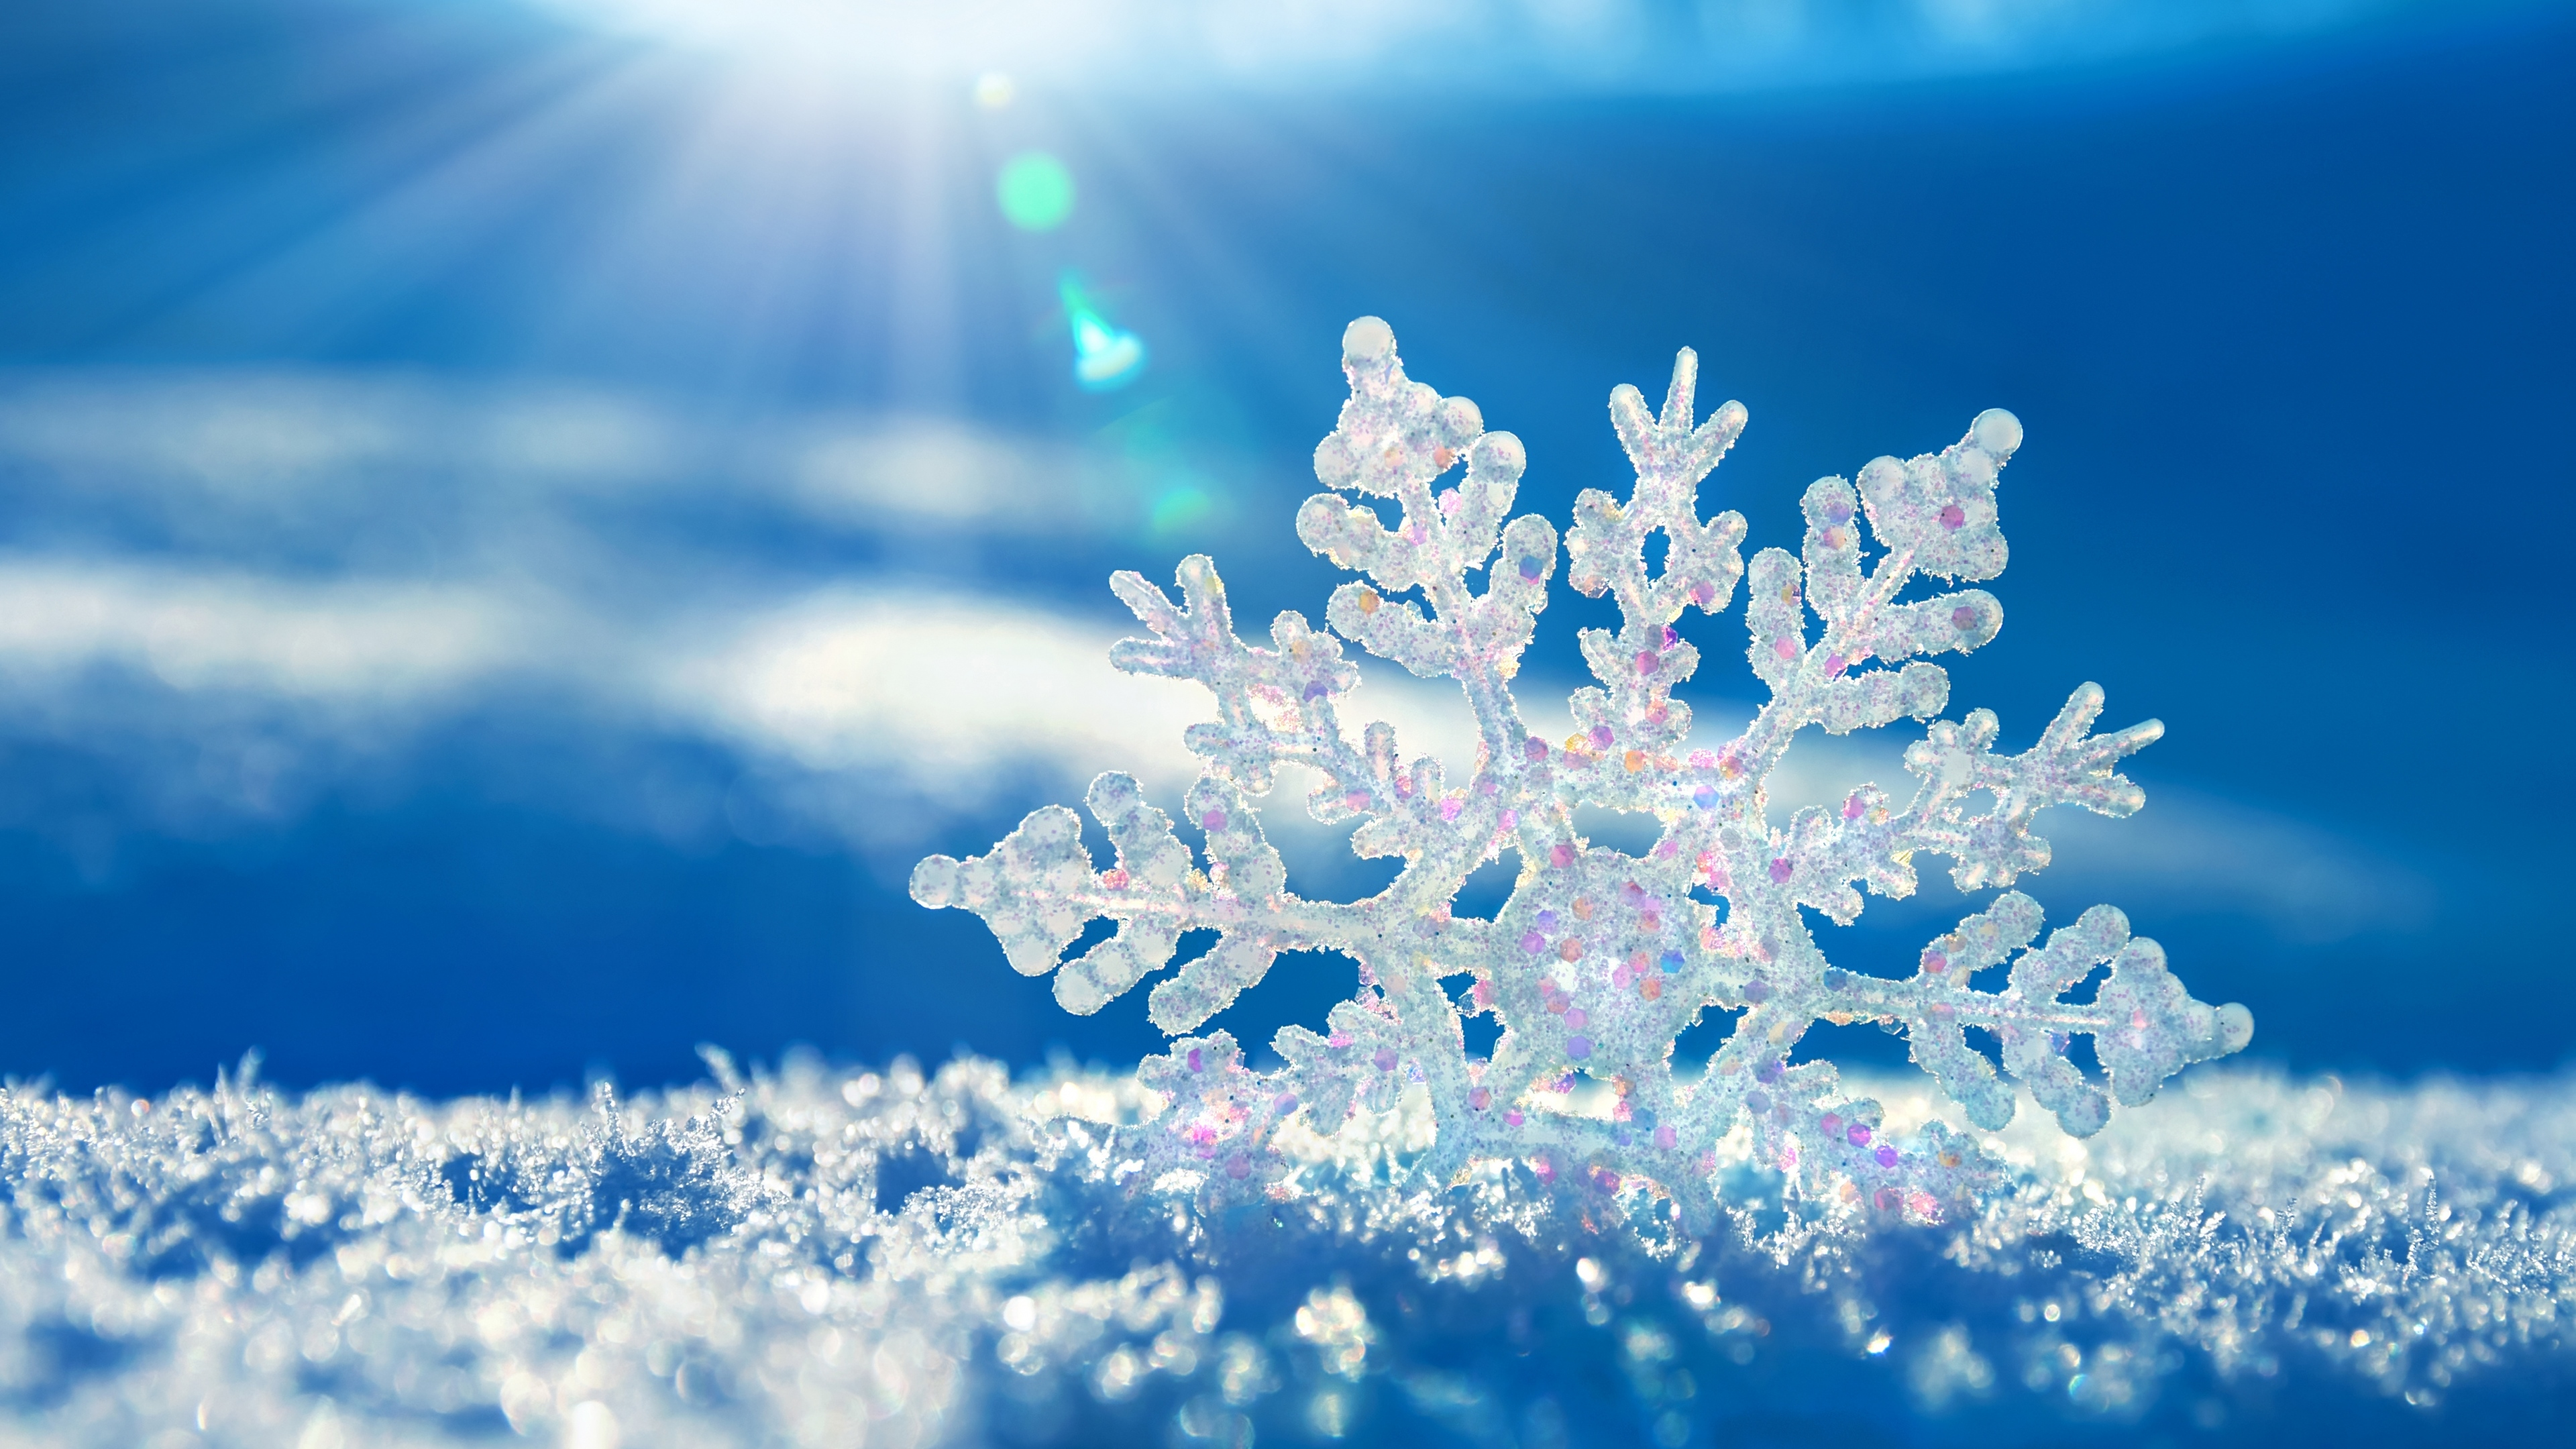 4K Ultra HD Snow Wallpapers HD, Desktop Backgrounds 3840x2160